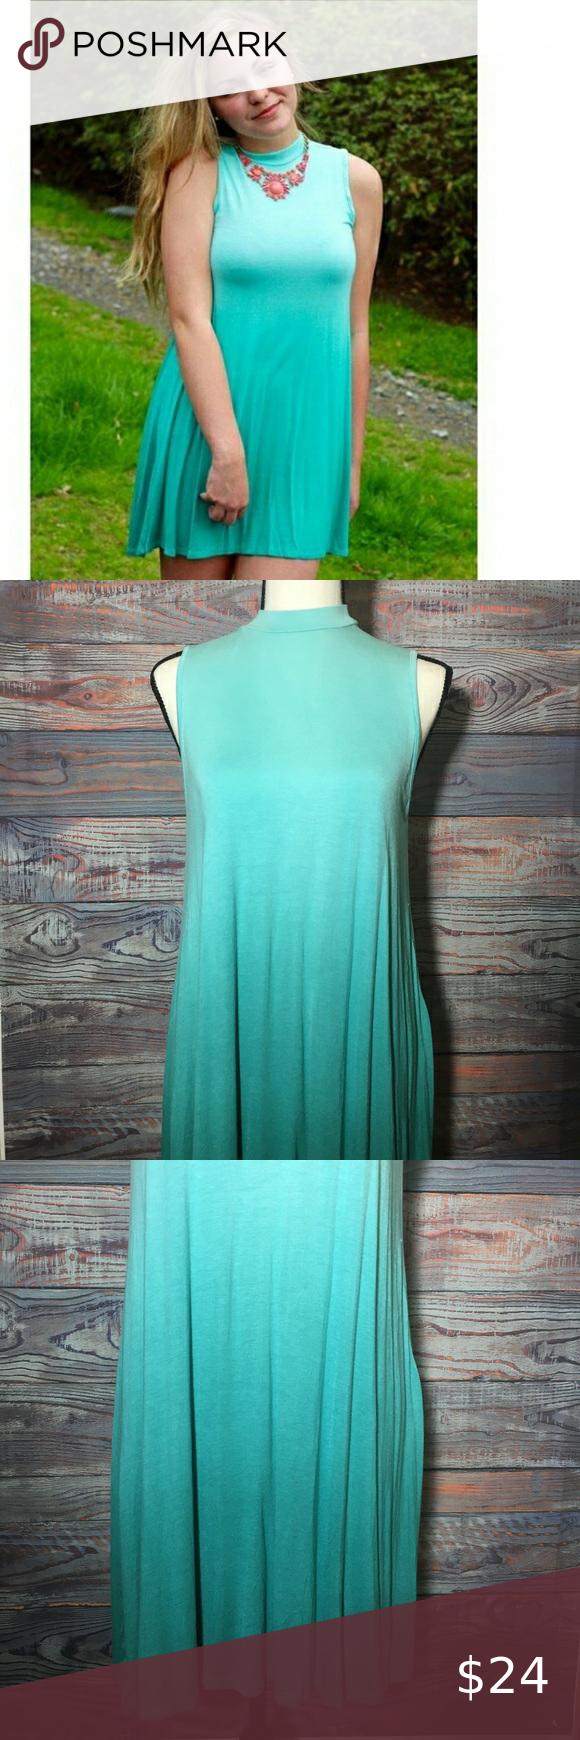 2x Host Pick Beautiful Ombre Green Maxi Dress Maxi Dress Green Boutique Maxi Dresses Maxi Dress With Sleeves [ 1740 x 580 Pixel ]